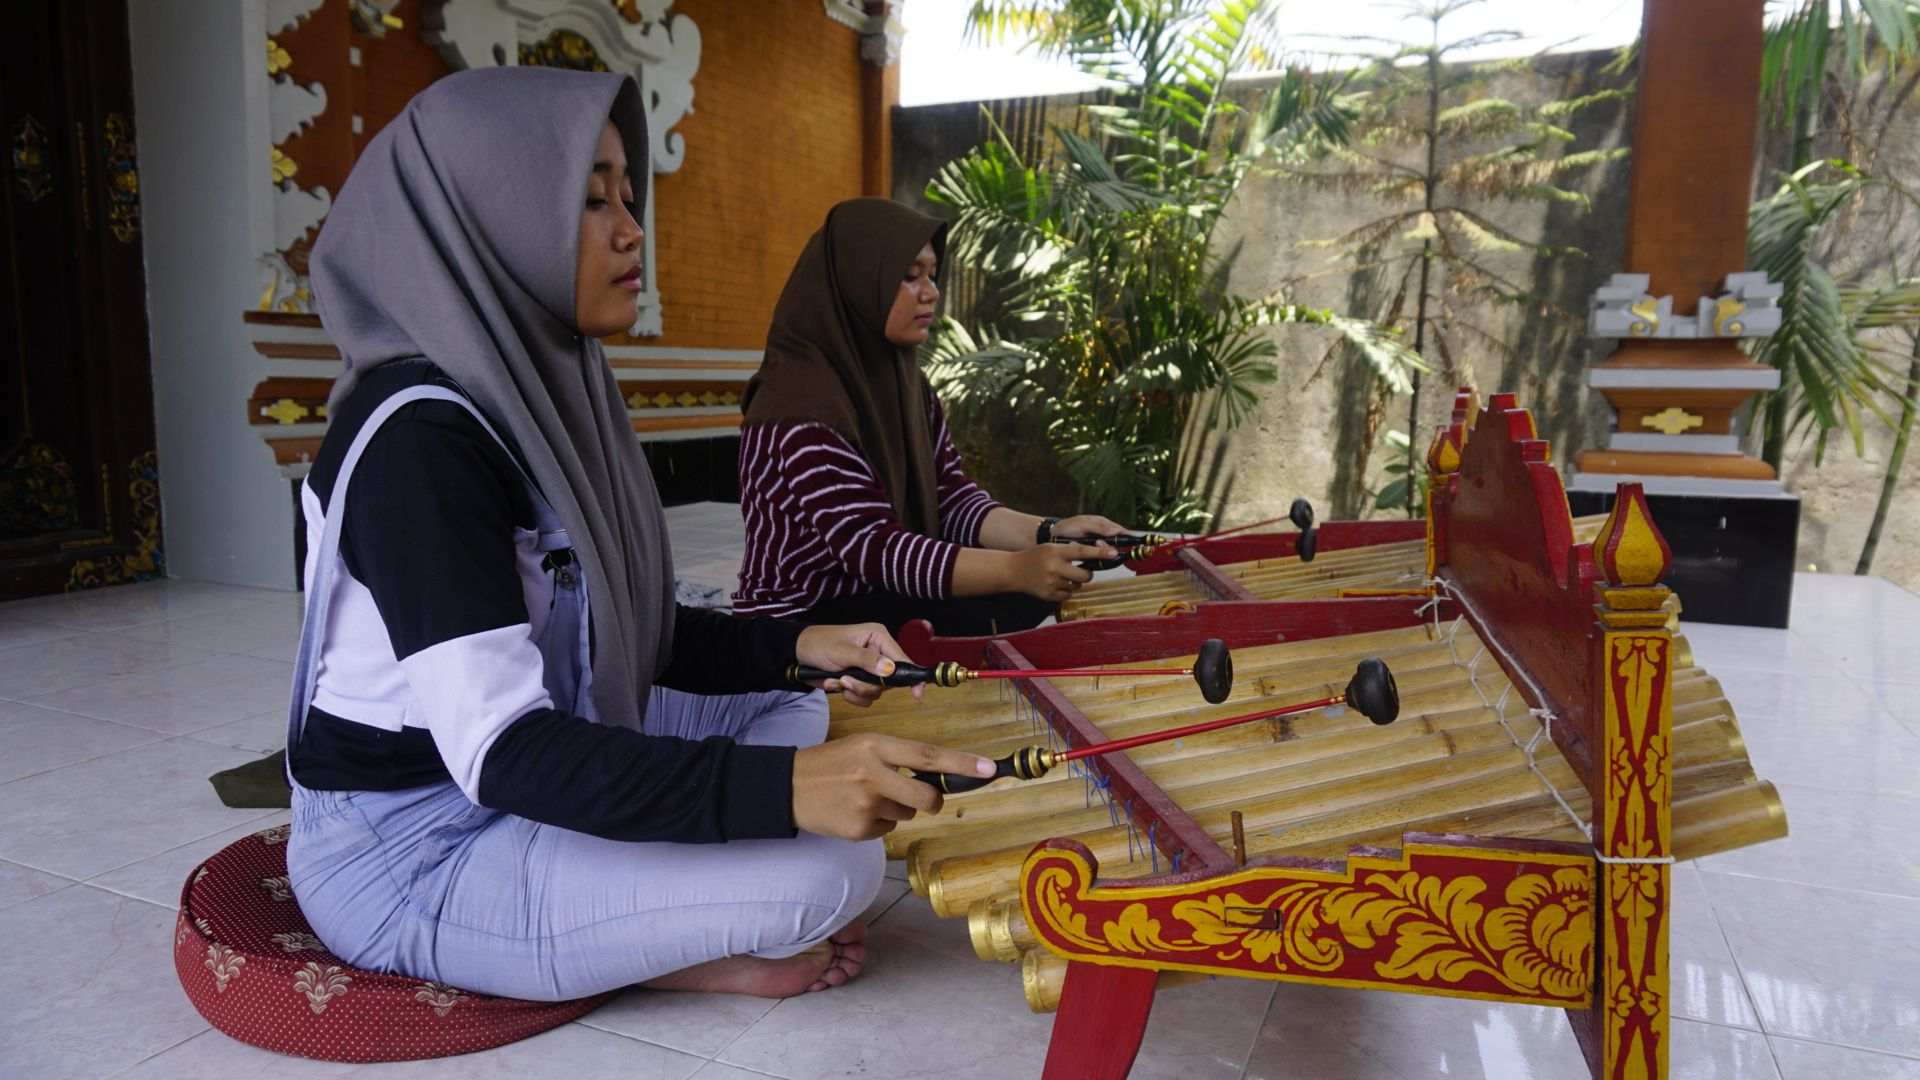 Apakah Warga Bali akan Melupakan Cara Bermain Rindik?